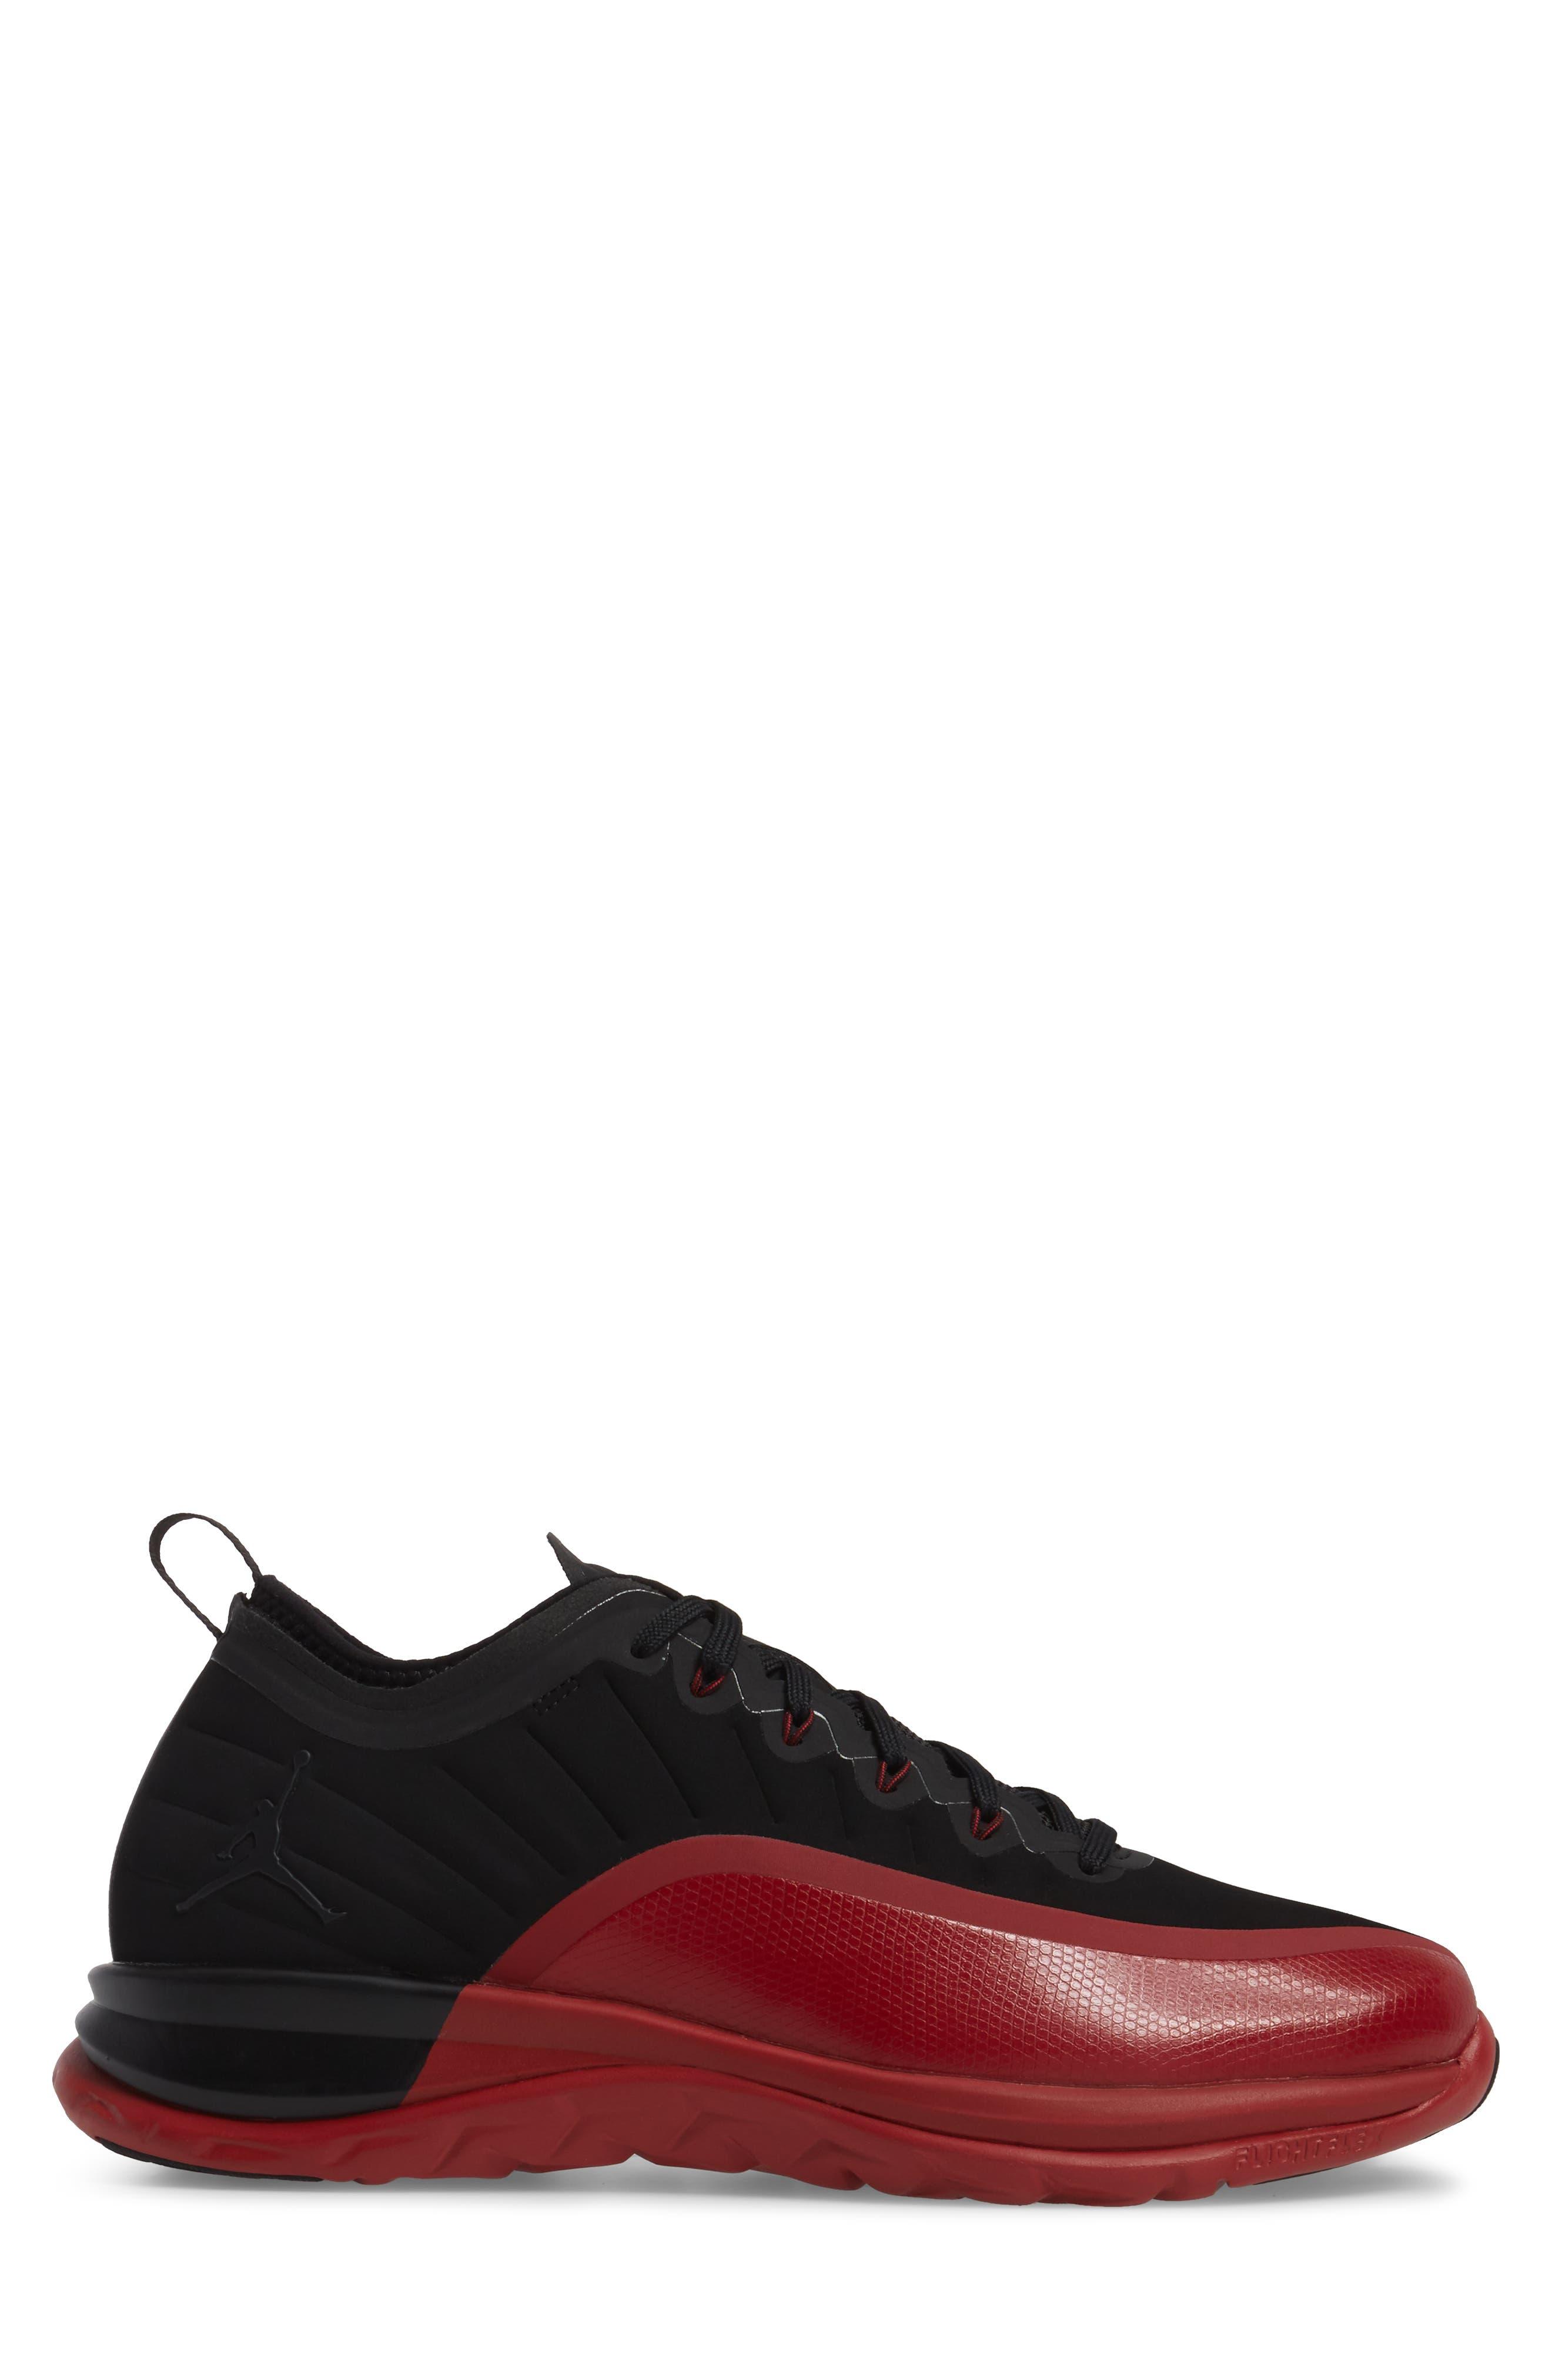 Jordan Trainer Prime Sneaker,                             Alternate thumbnail 3, color,                             006